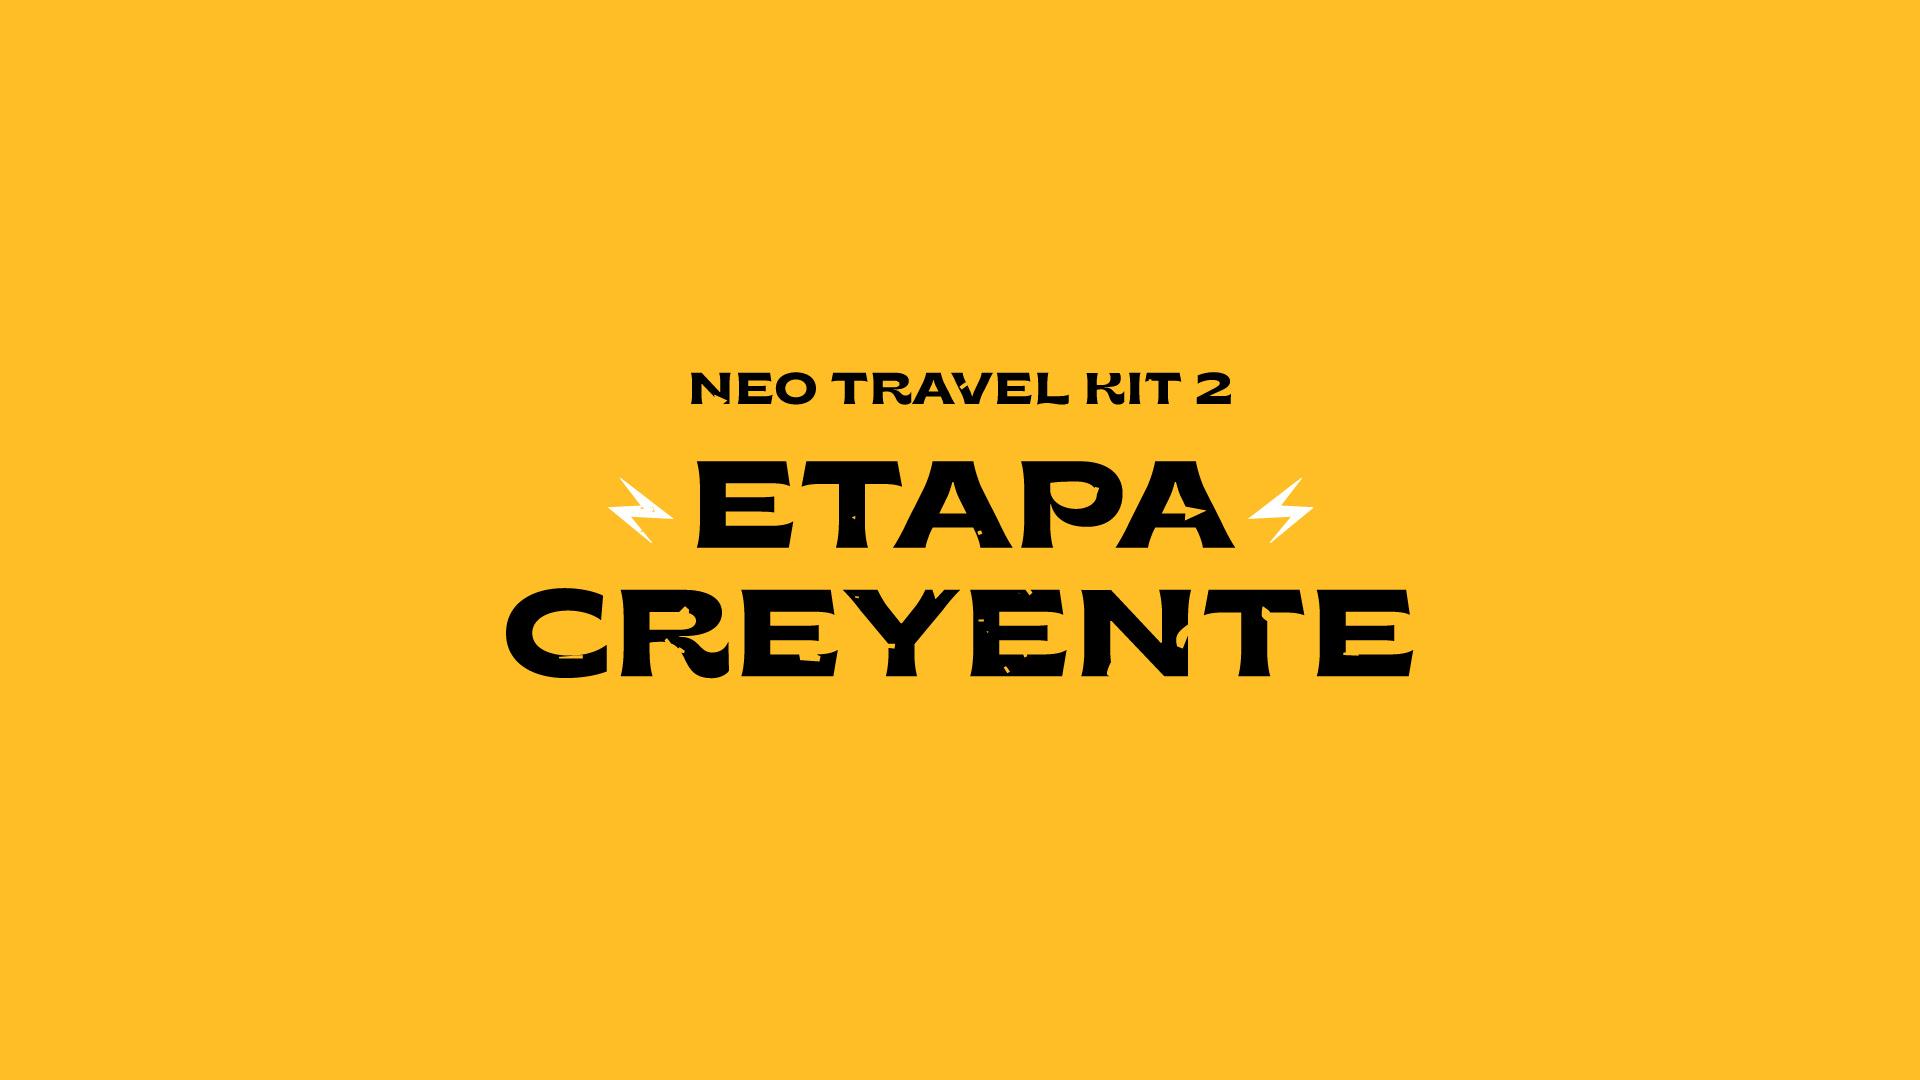 Neo Travel Kit 2 - Etapa Creyentes